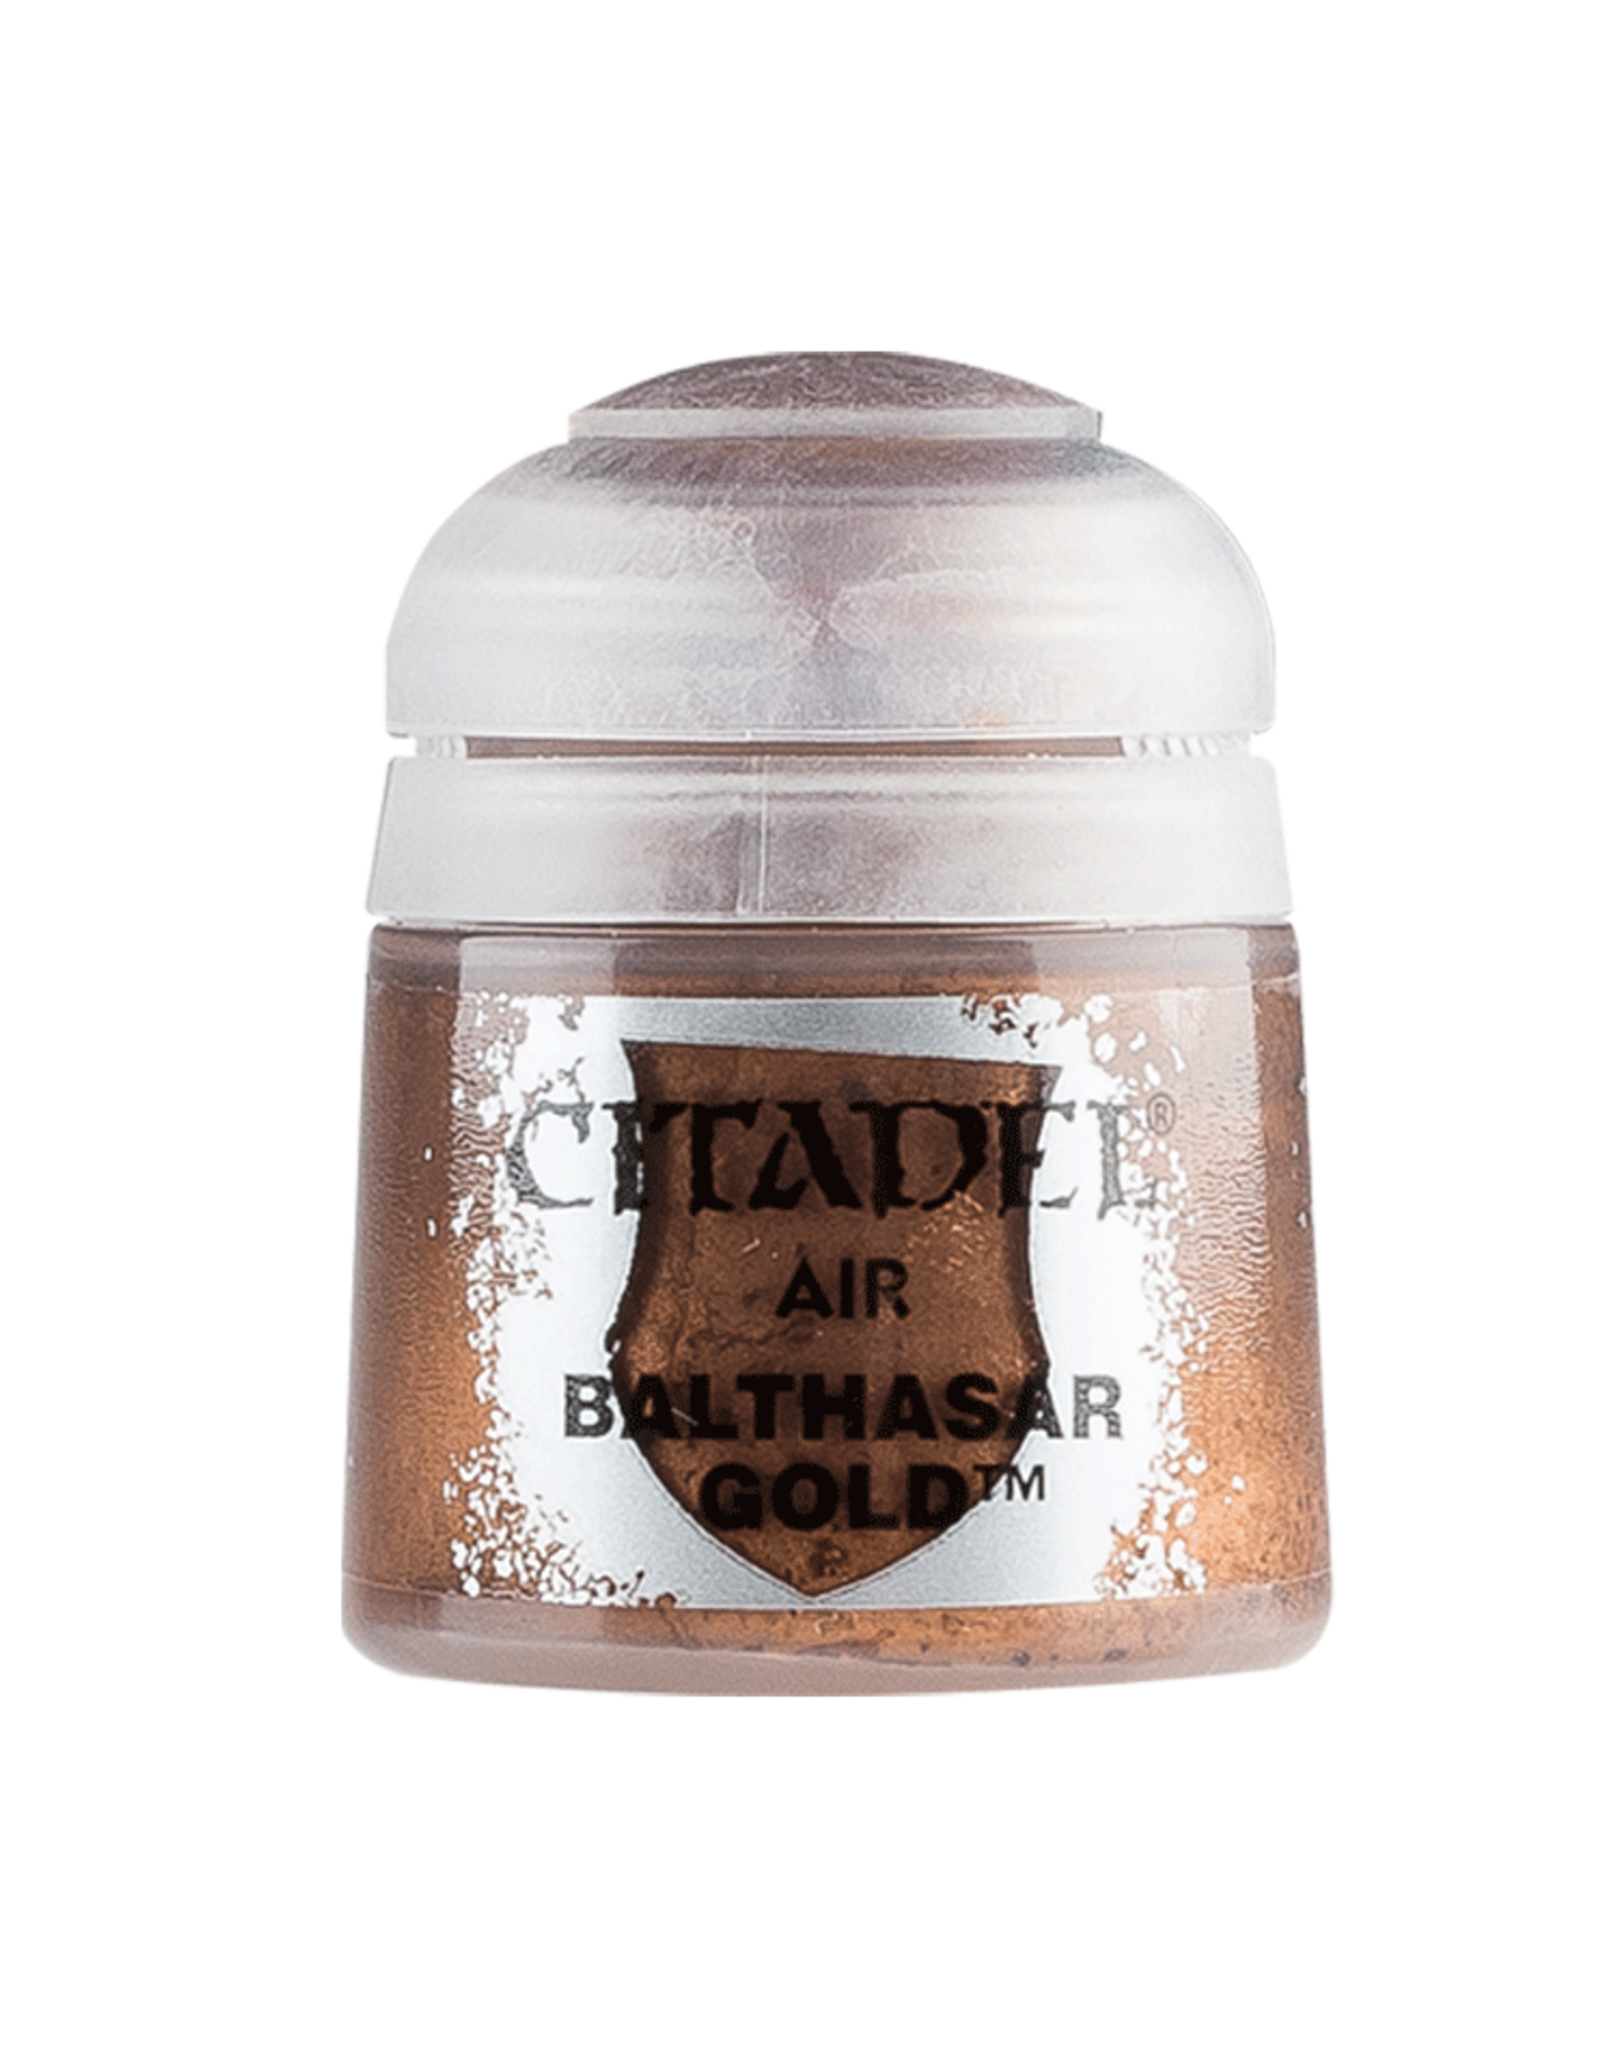 Citadel Citadel Air: Balthasar Gold (24ml)